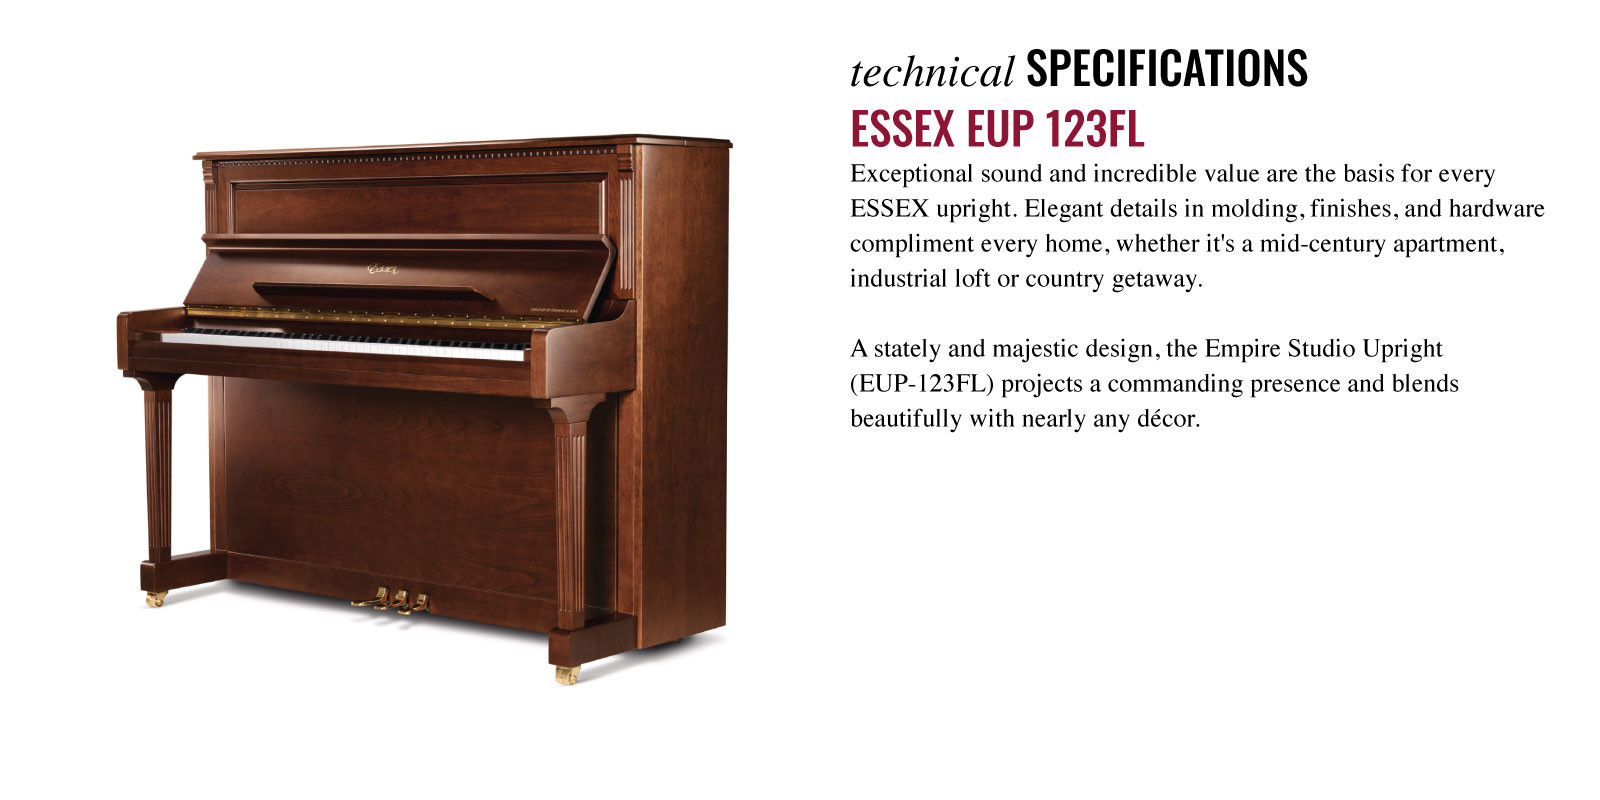 PP-Essex-EUP-123FL-Details-1.jpg